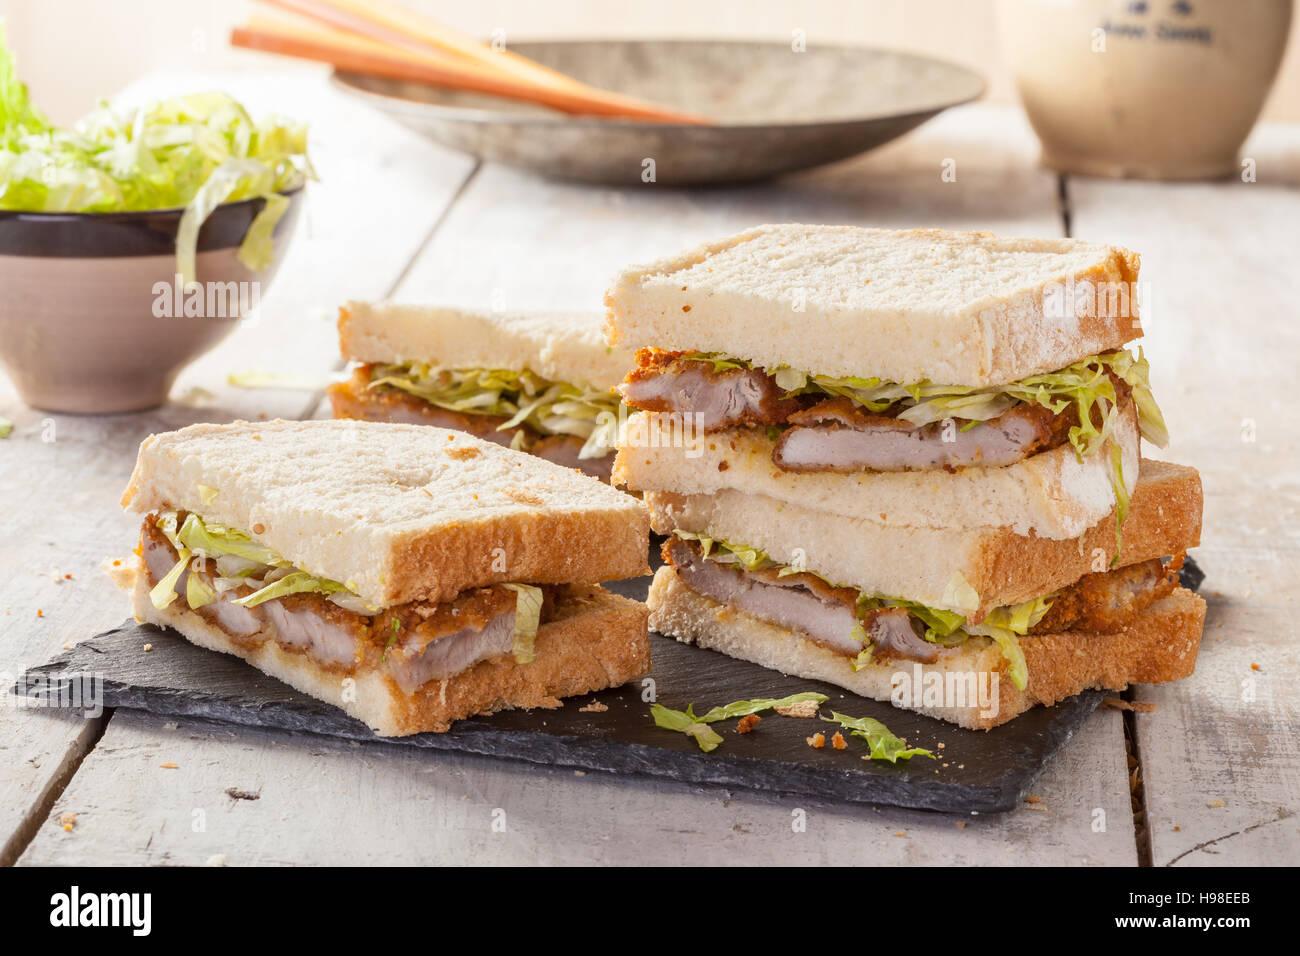 Katsu Sando, a popular Japanese sandwich with pok cutlet. - Stock Image